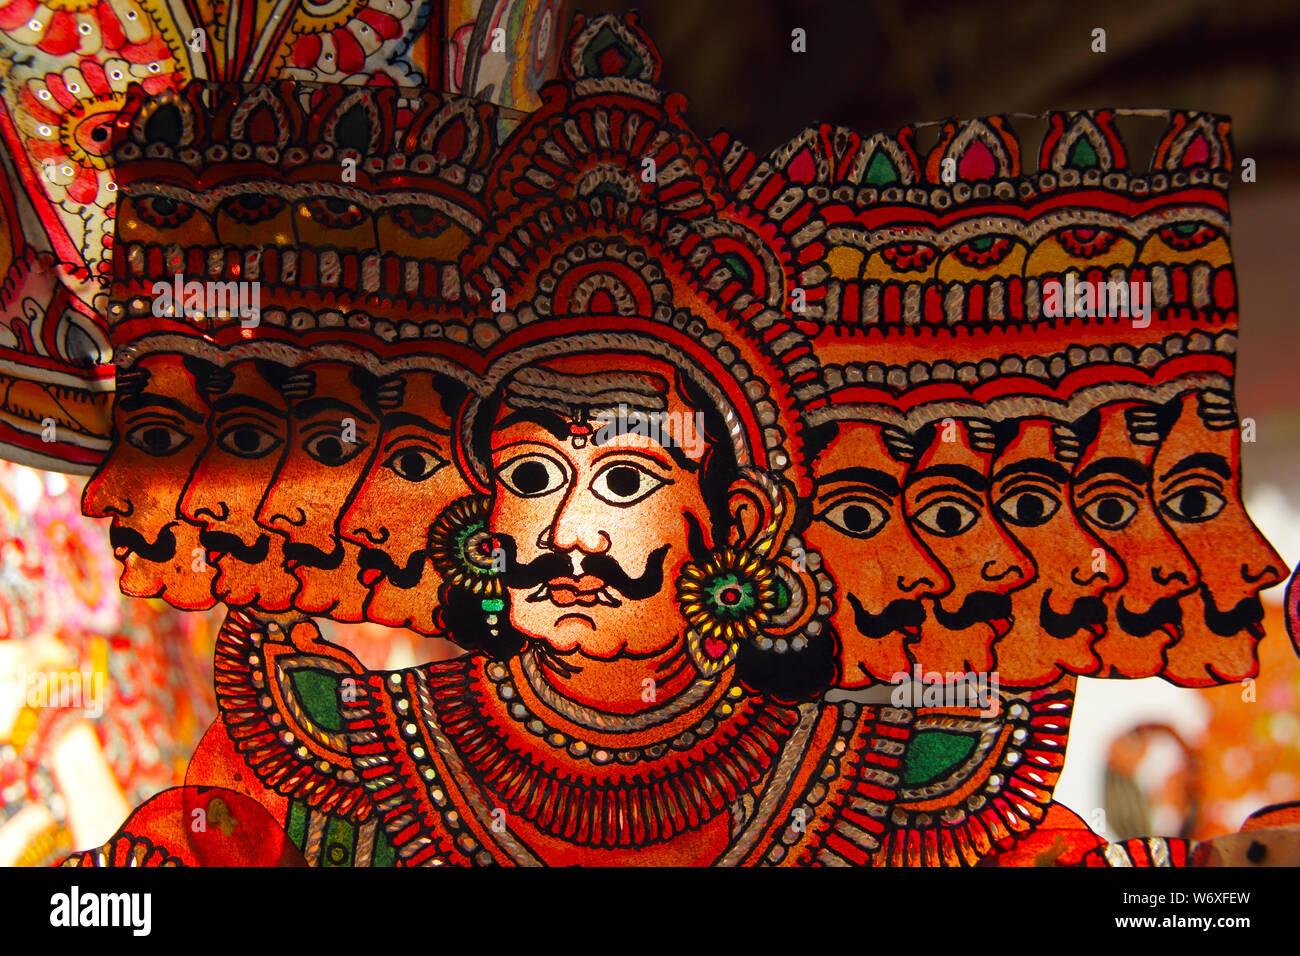 Ravana High Resolution Stock Photography And Images Alamy